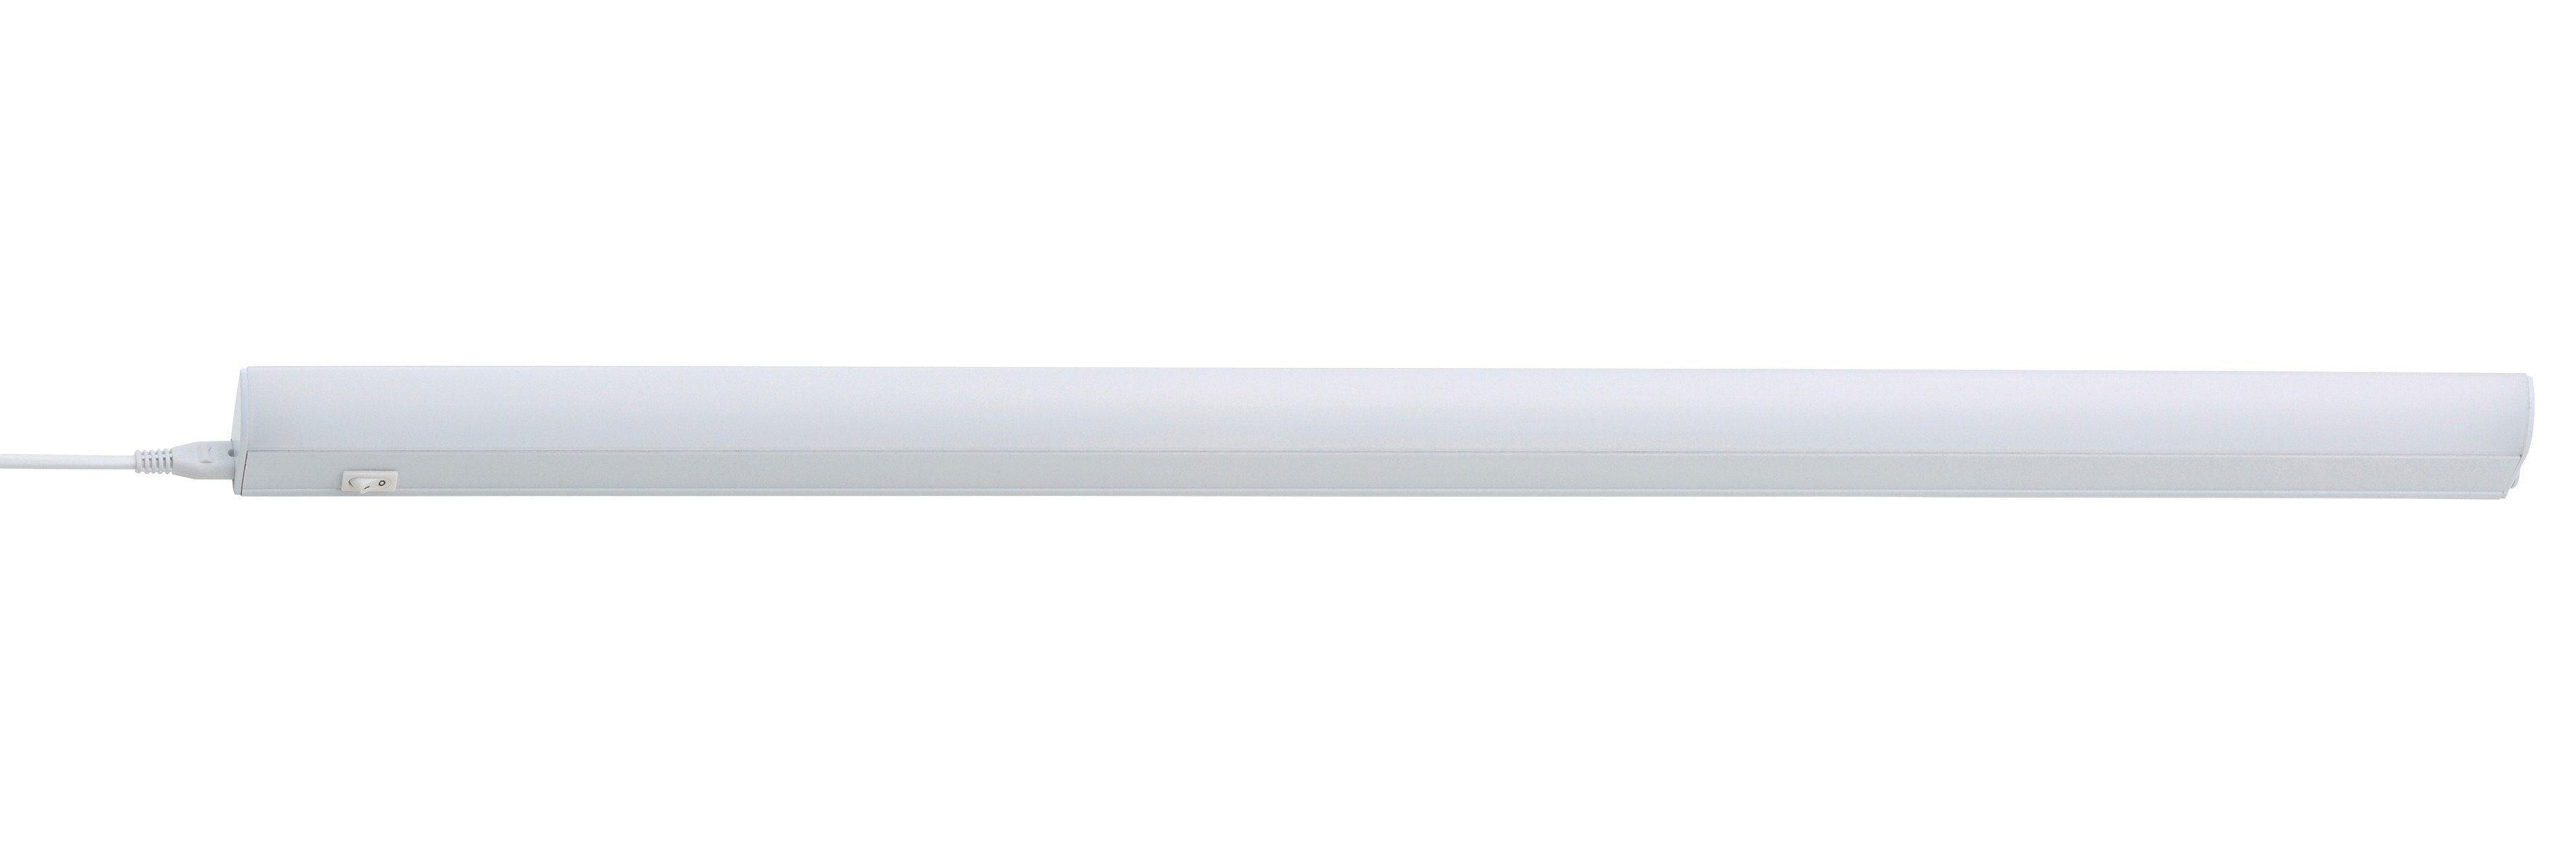 Briloner LED Unterbauleuchte »Cook & Light«, 15,6W